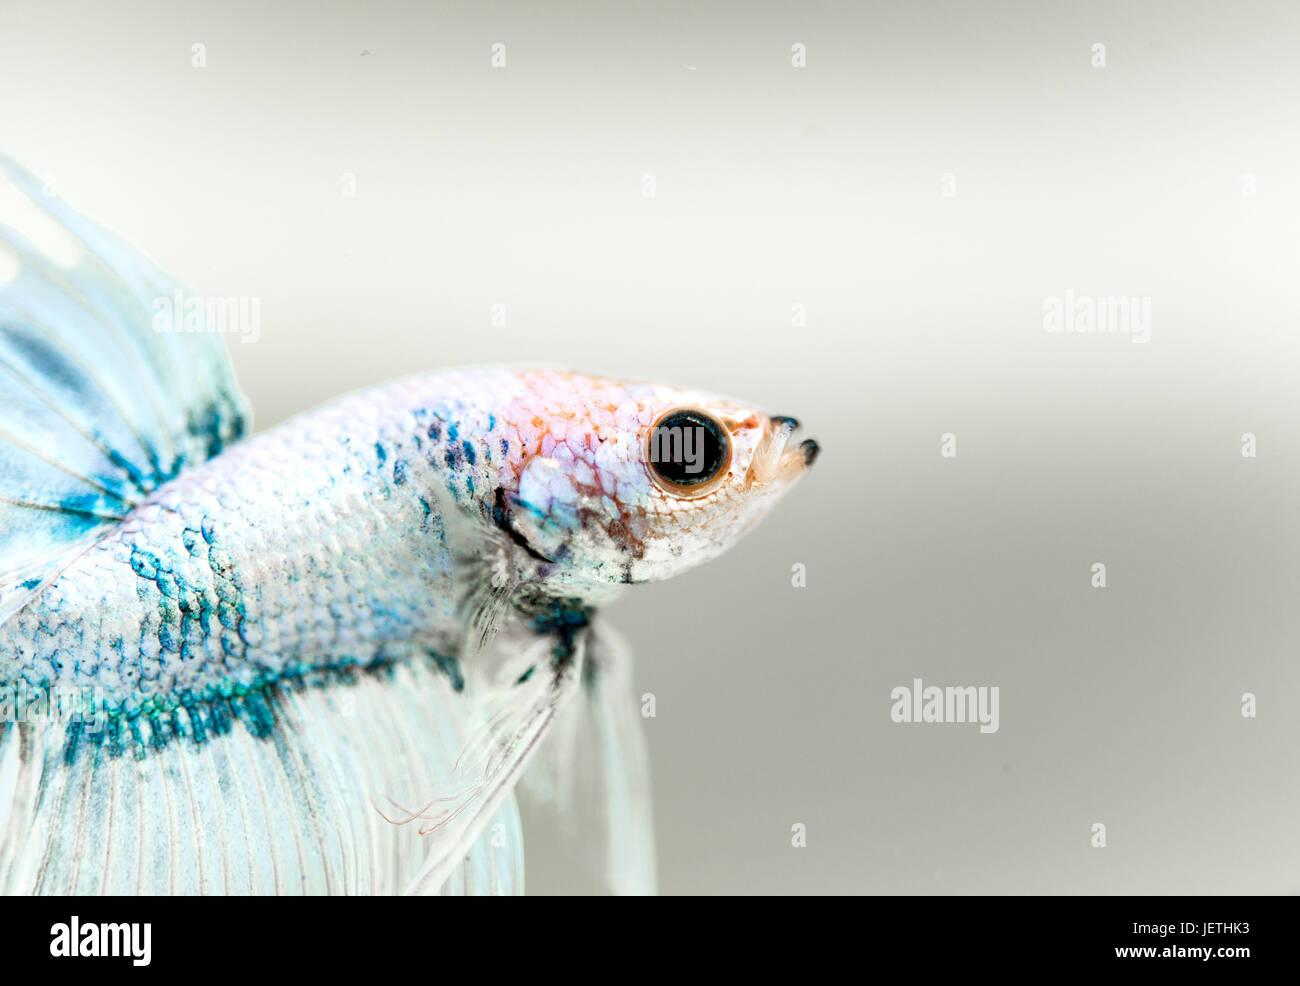 Siamese fighting fish - Stock Image